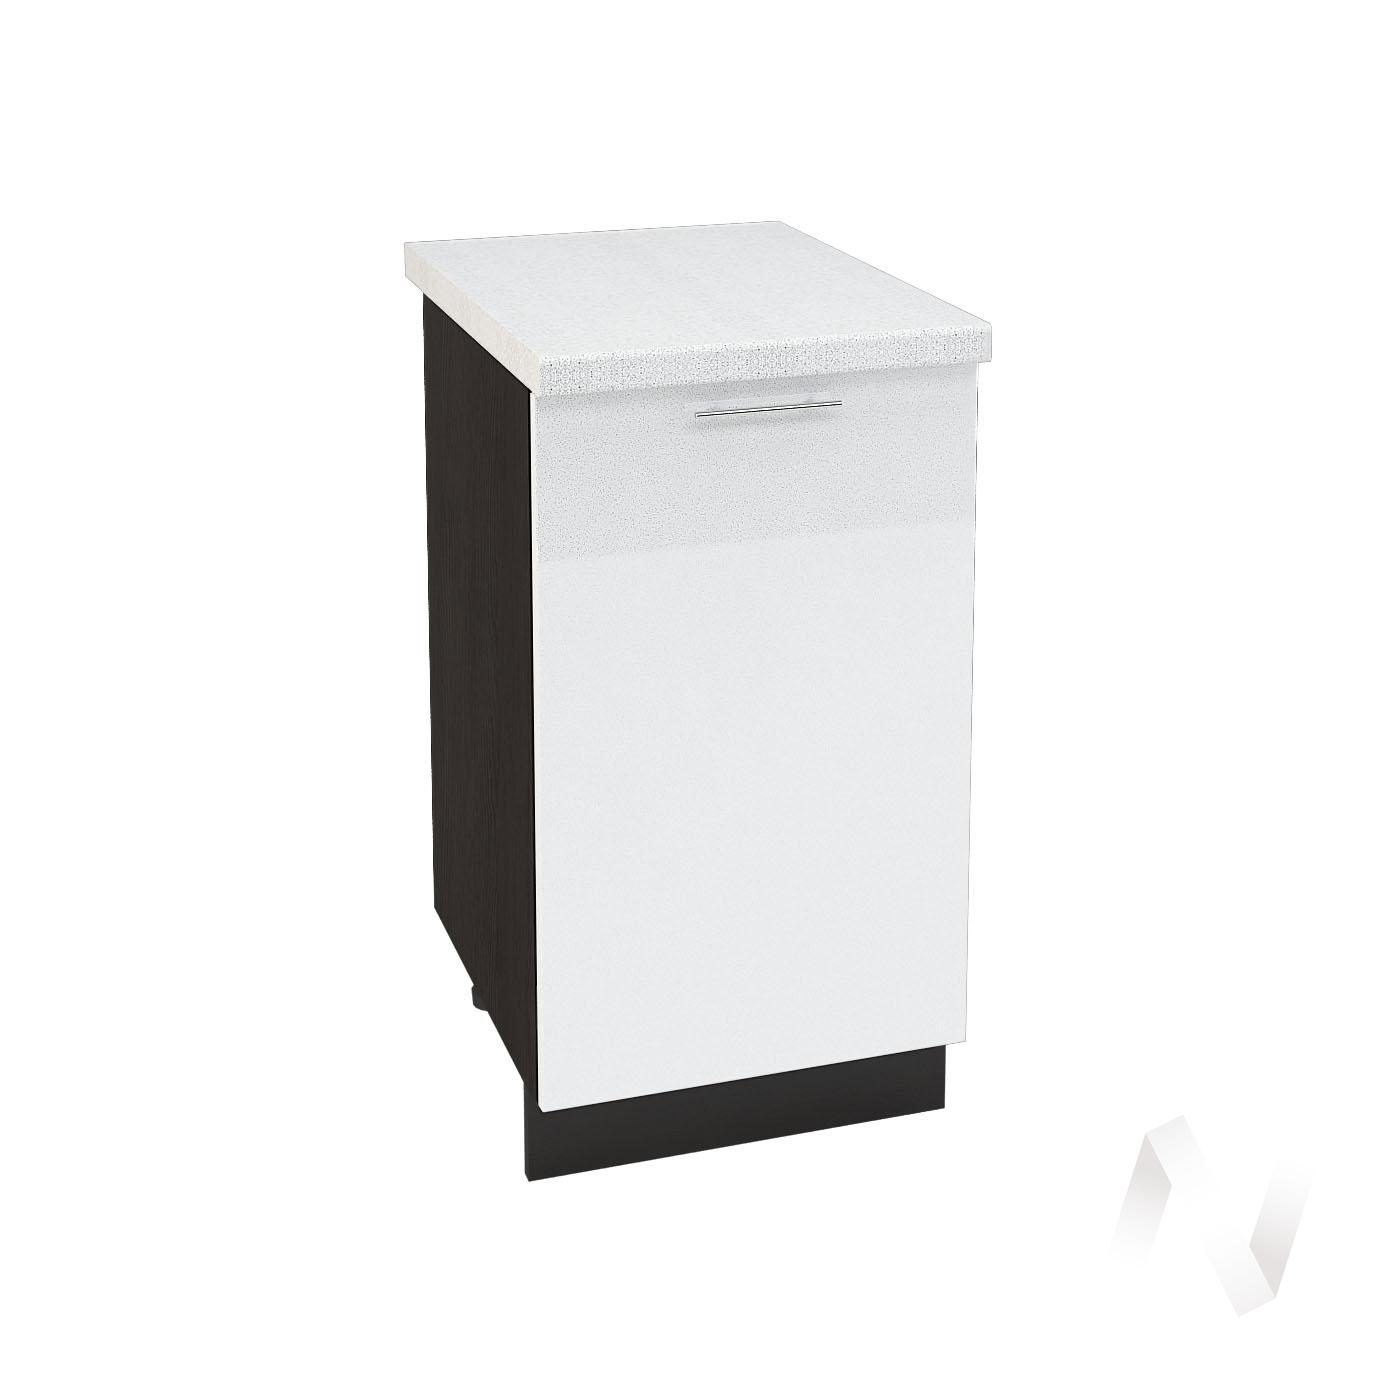 "Кухня ""Валерия-М"": Шкаф нижний 450, ШН 450 (белый металлик/корпус венге)"